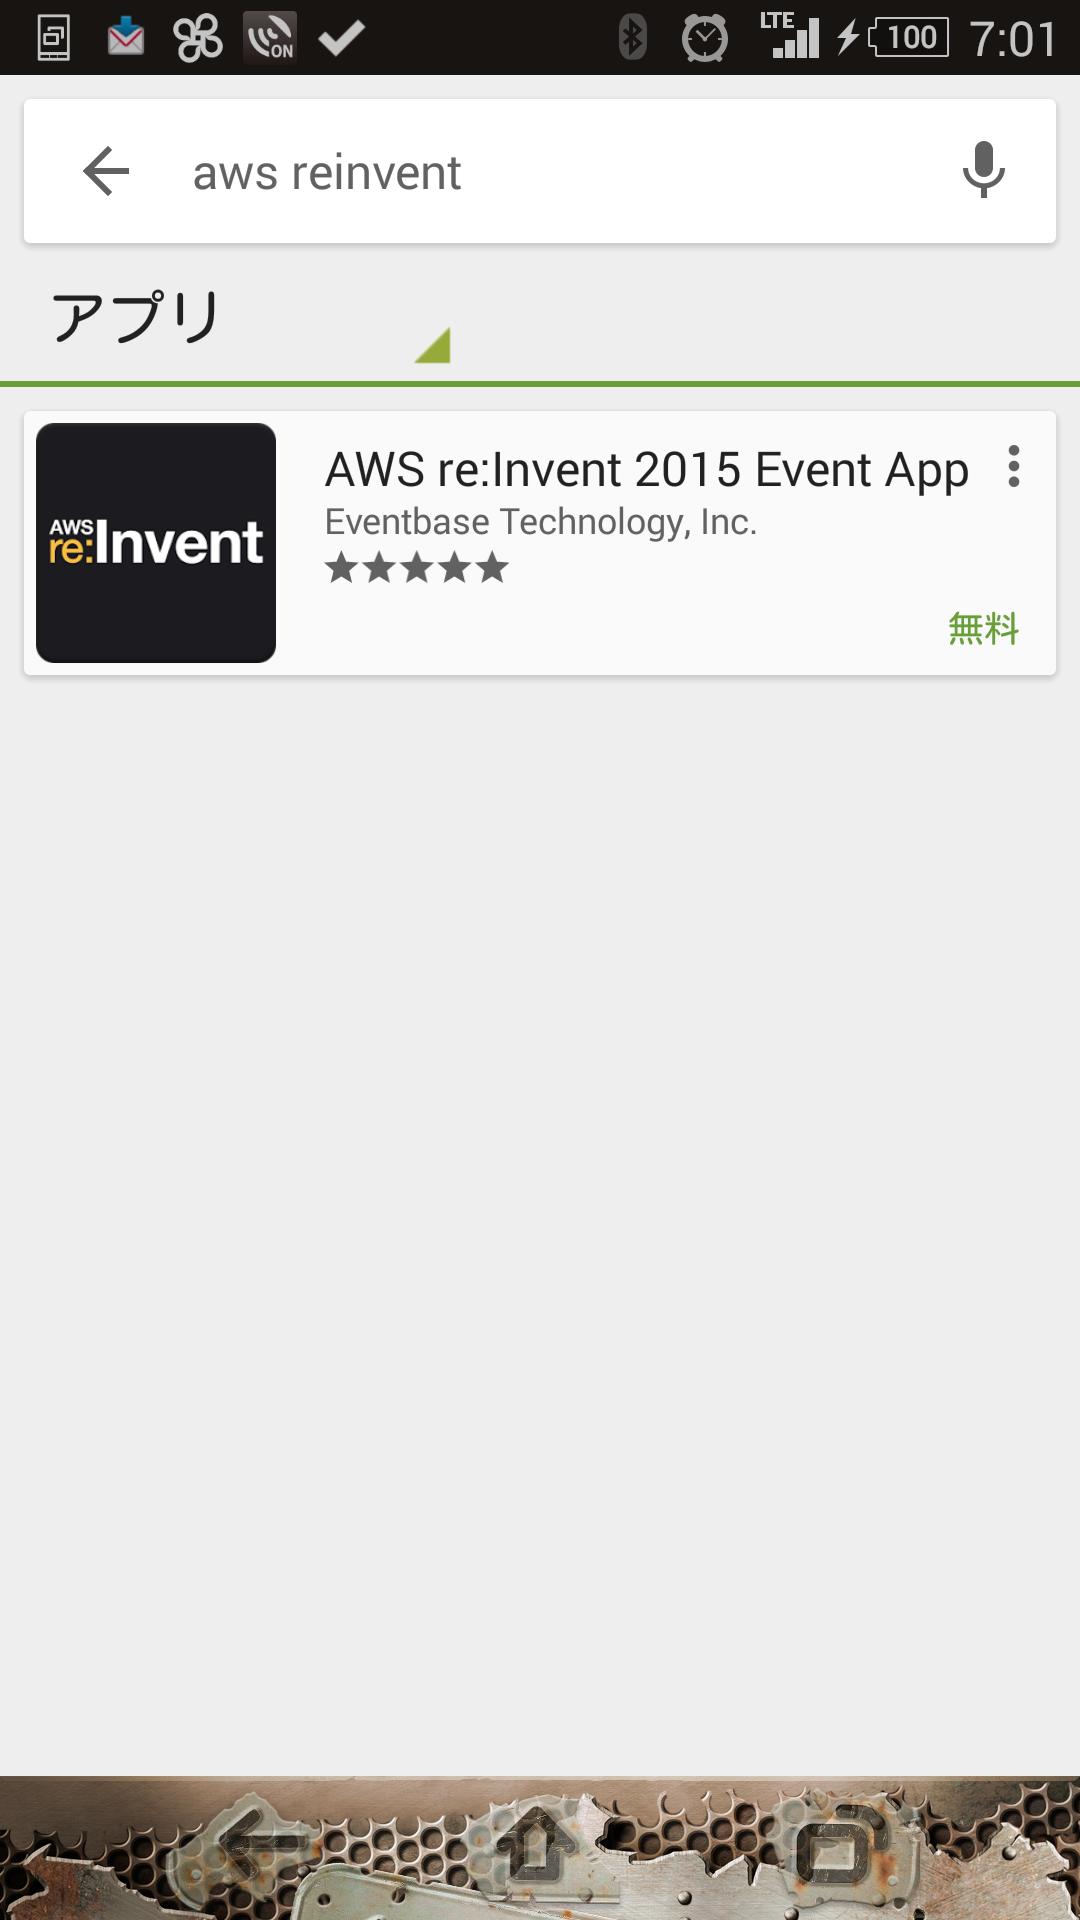 aws-reinvent-2015-event-app_01